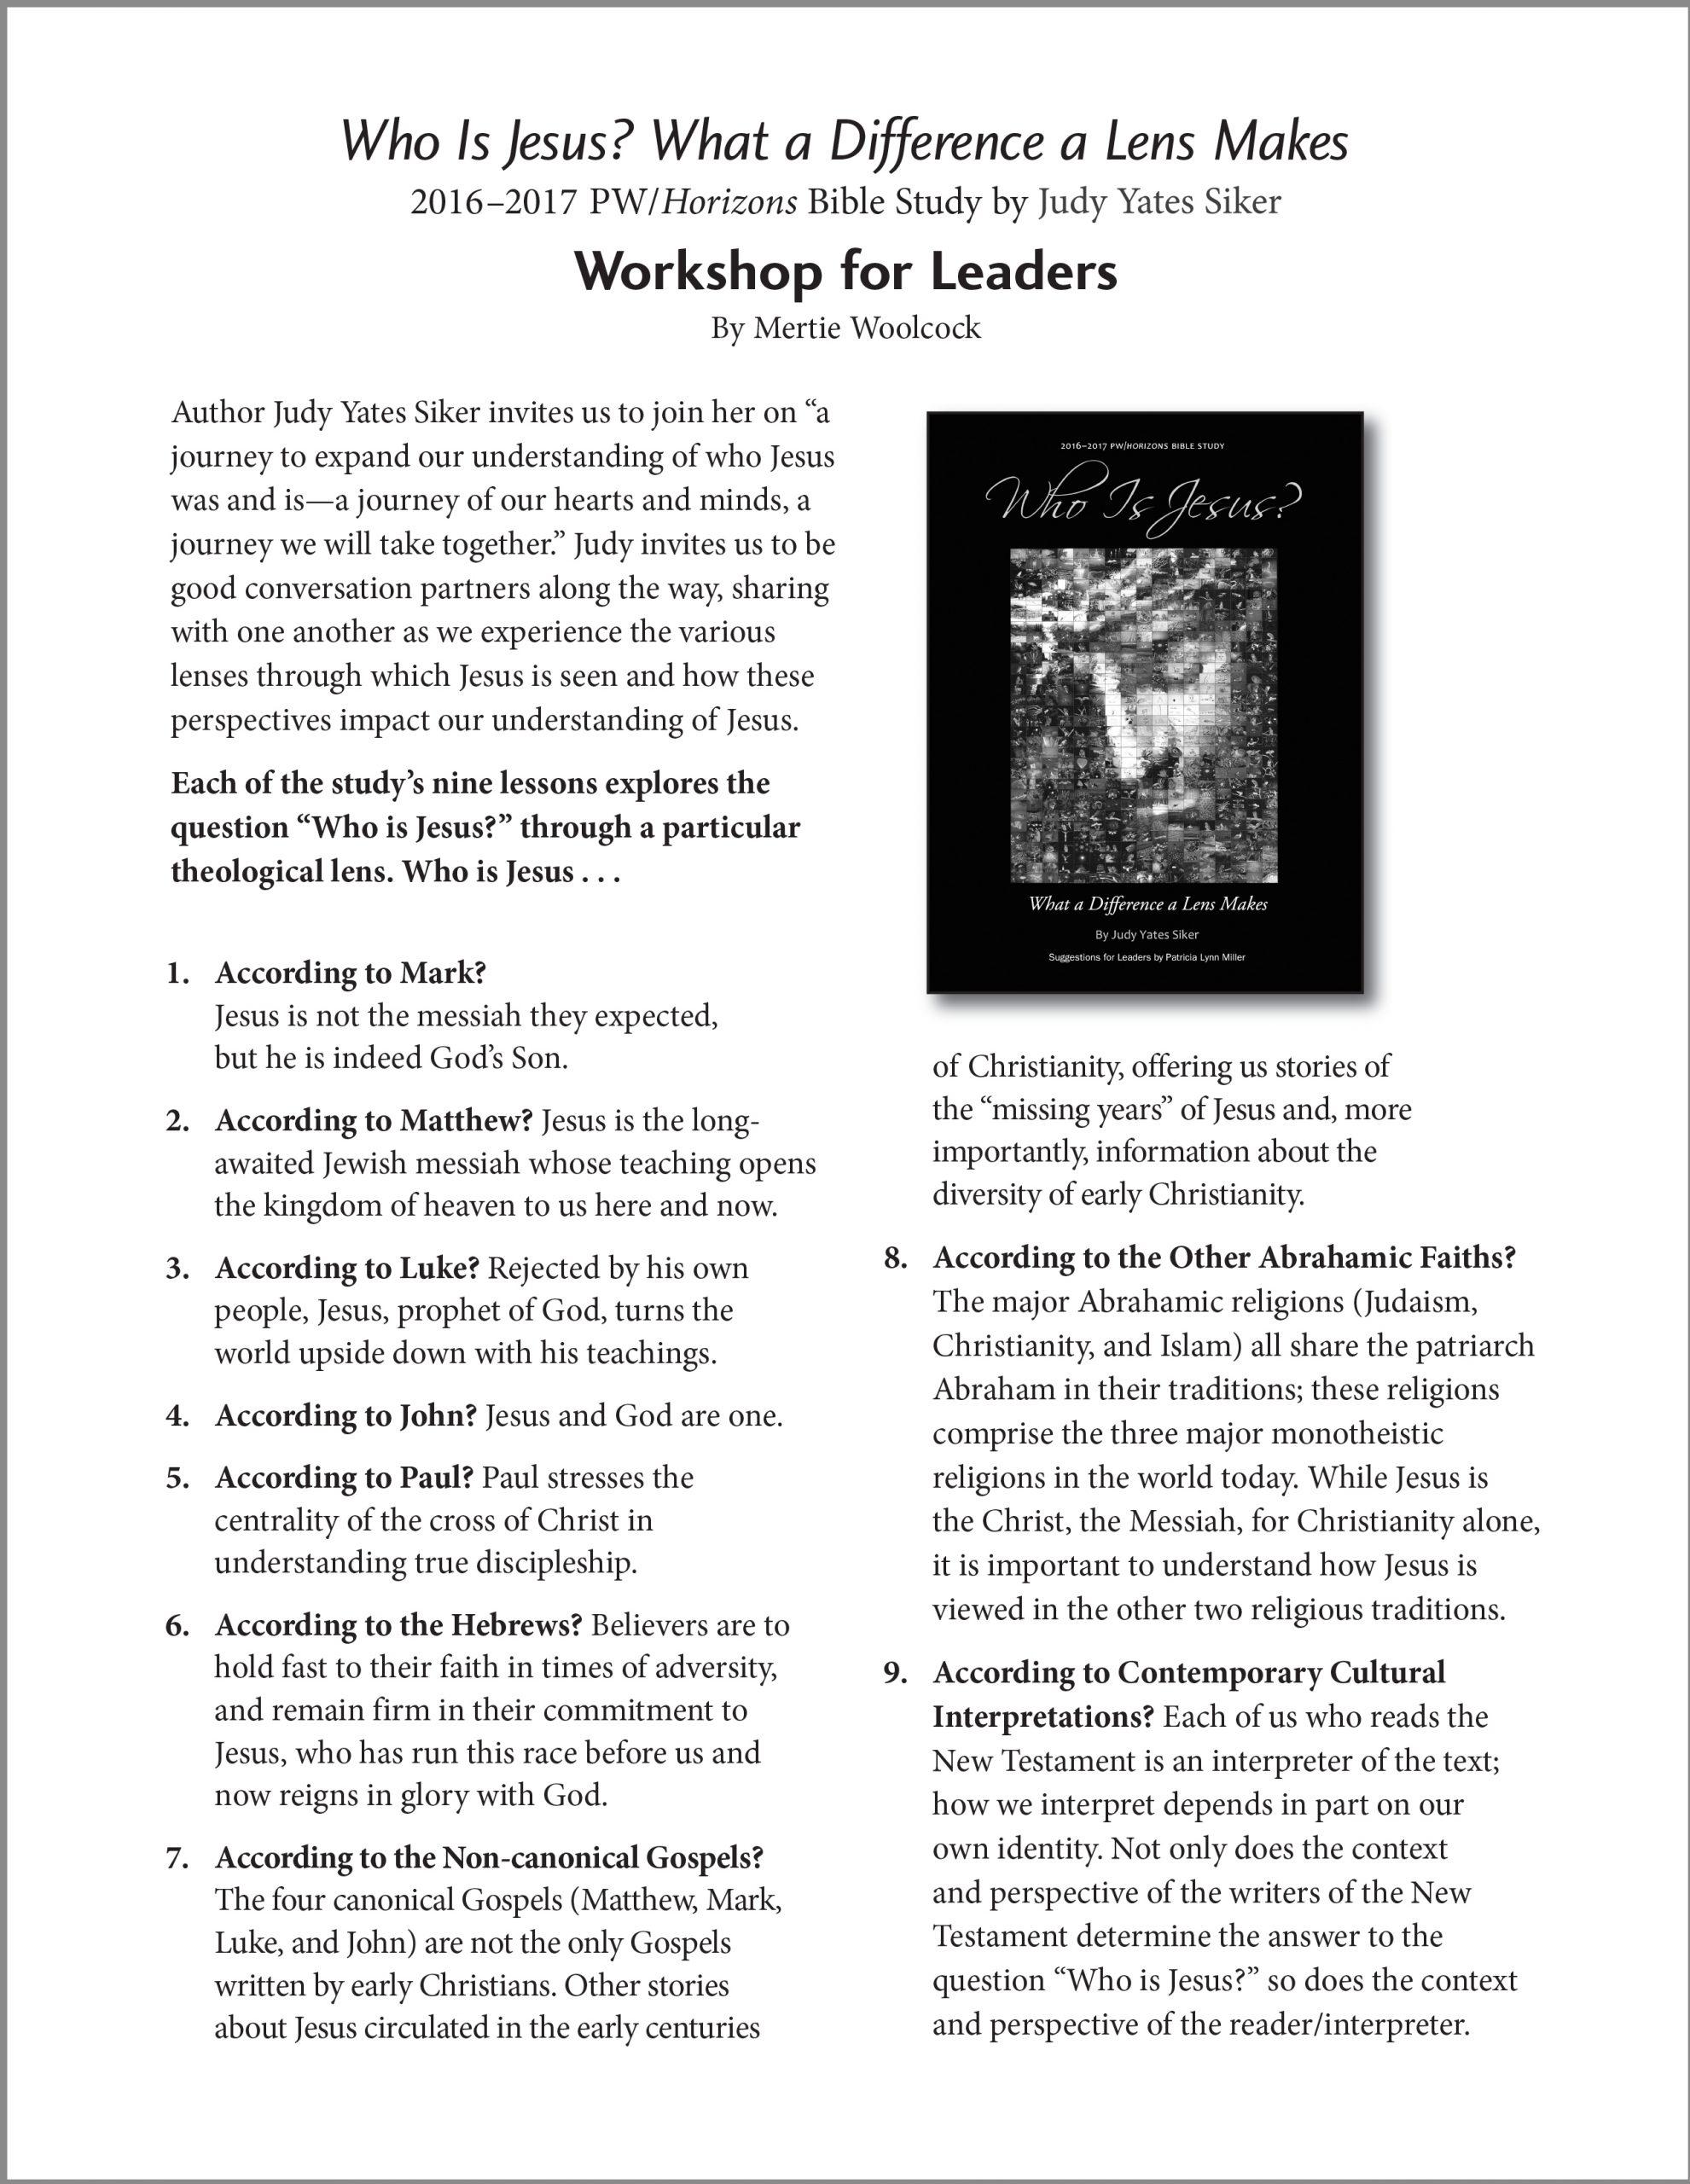 Who Is Jesus? Workshop for Leaders